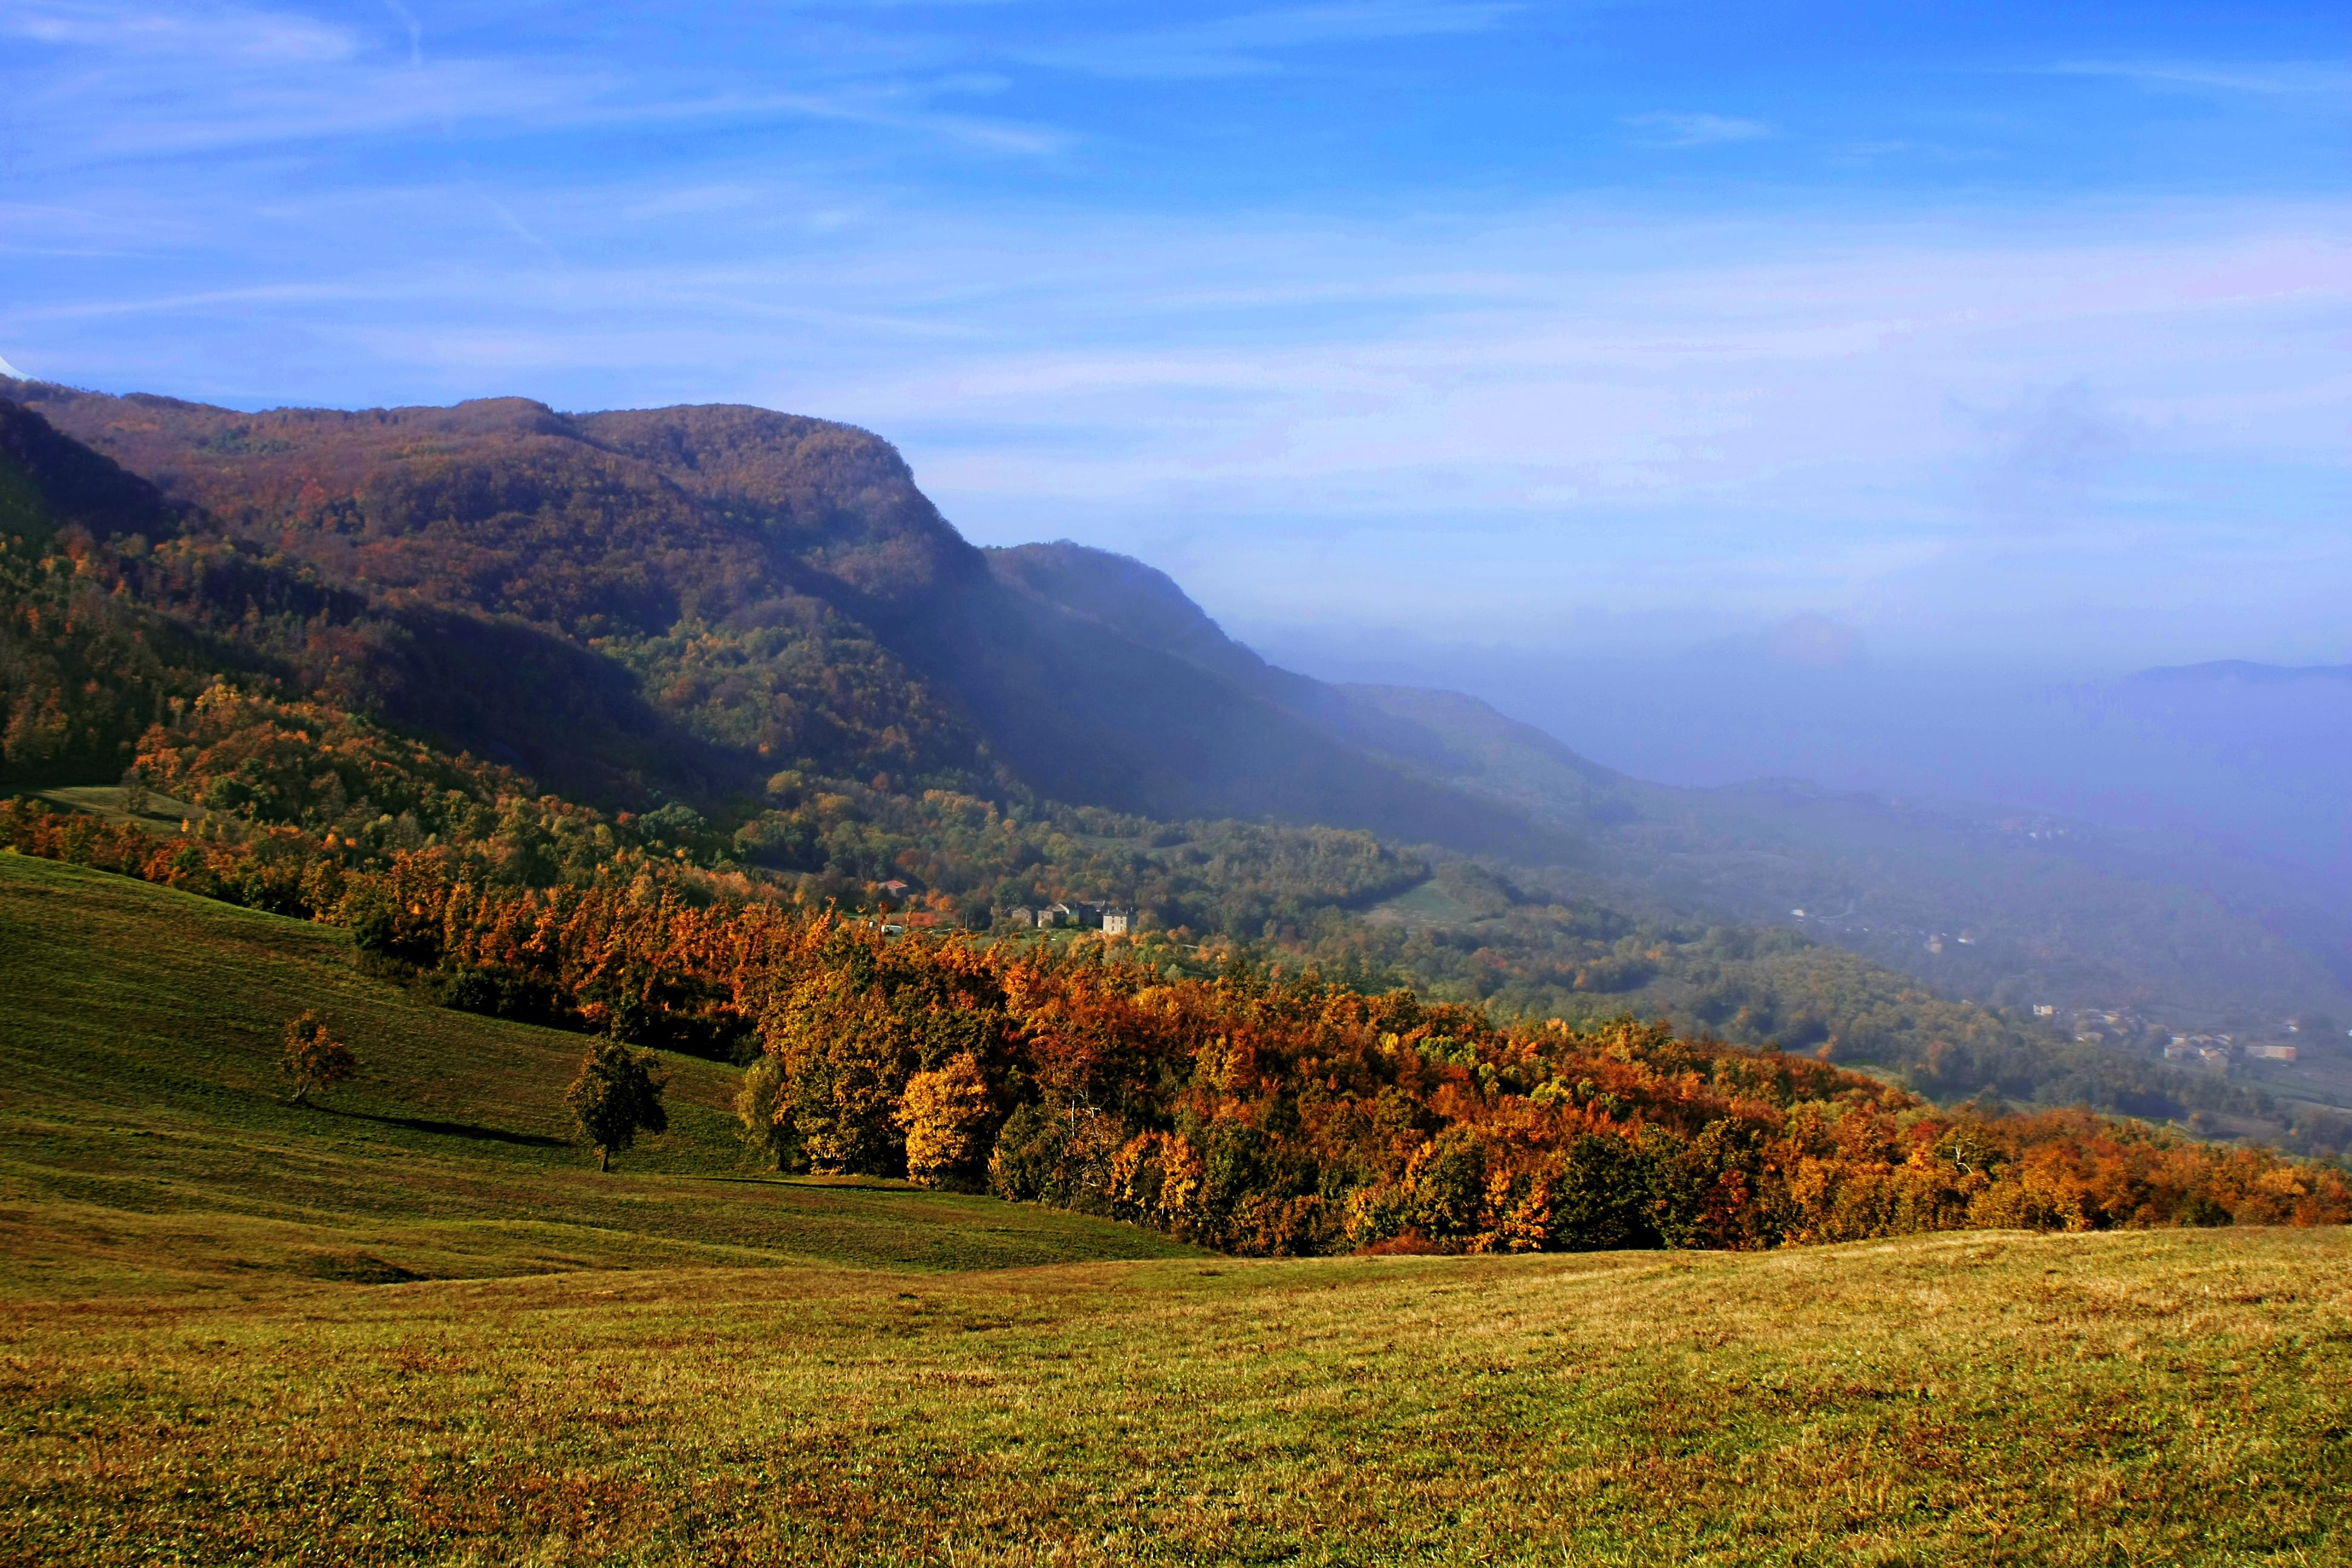 Santa franca landscape photo